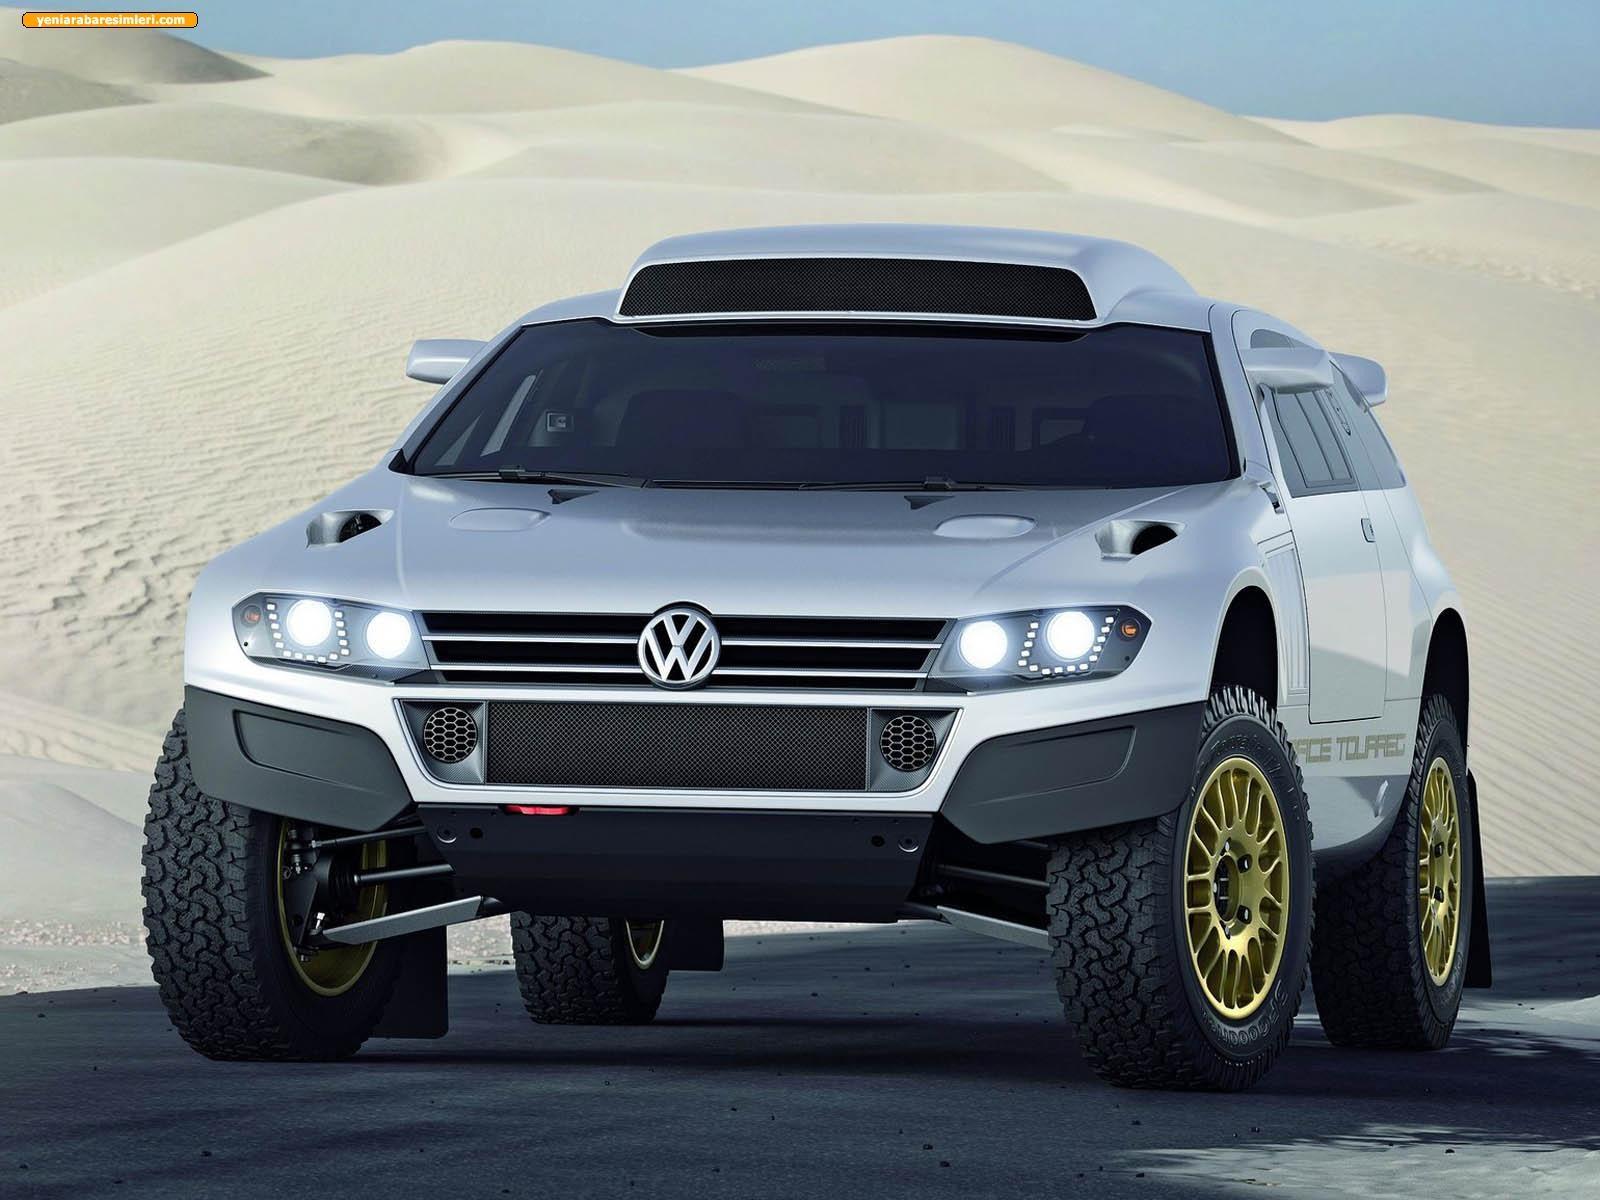 2015 volkswagen touareg cc 1024 x 768 wallpaper new. Black Bedroom Furniture Sets. Home Design Ideas